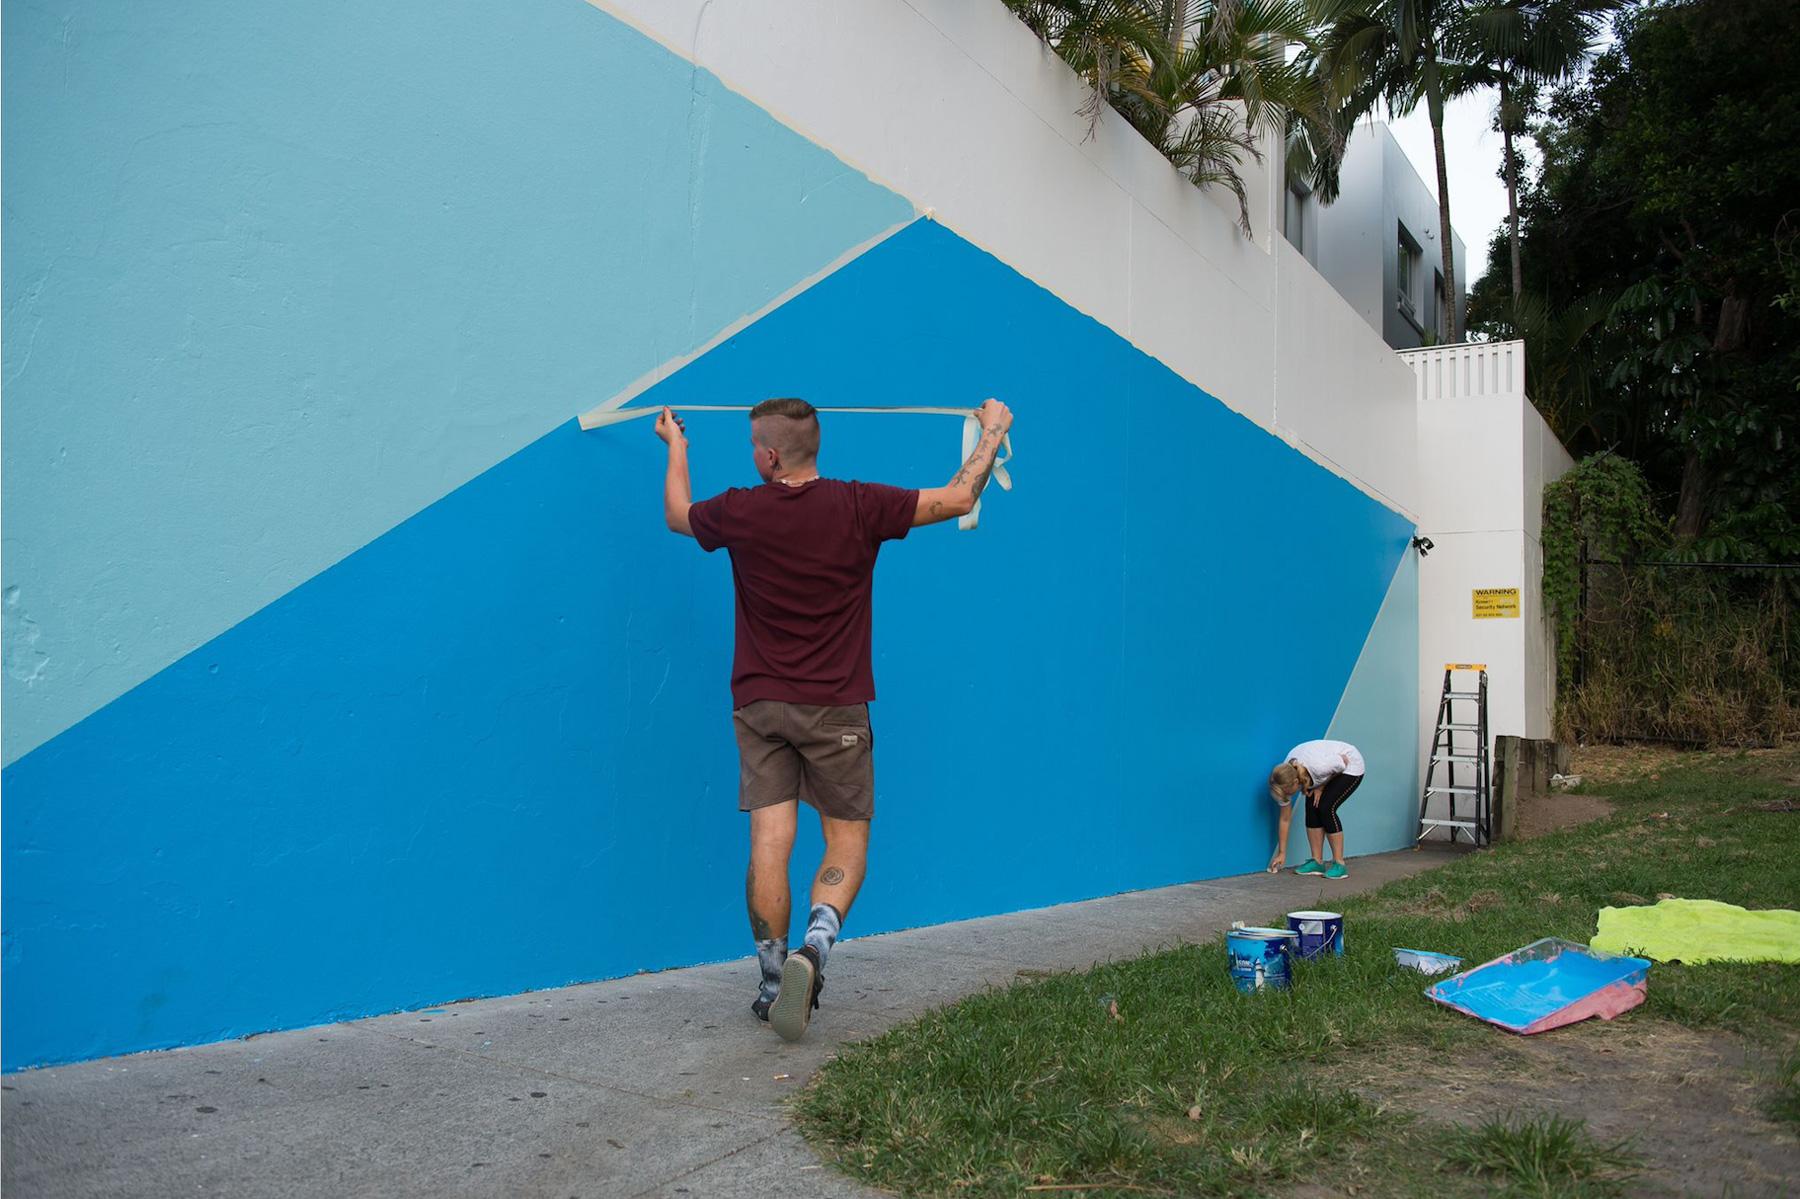 home-sweet-home-mural-bleach-festival-gold-coast-artwork-agency-claudio-kirac-laura-strange-bts.jpg